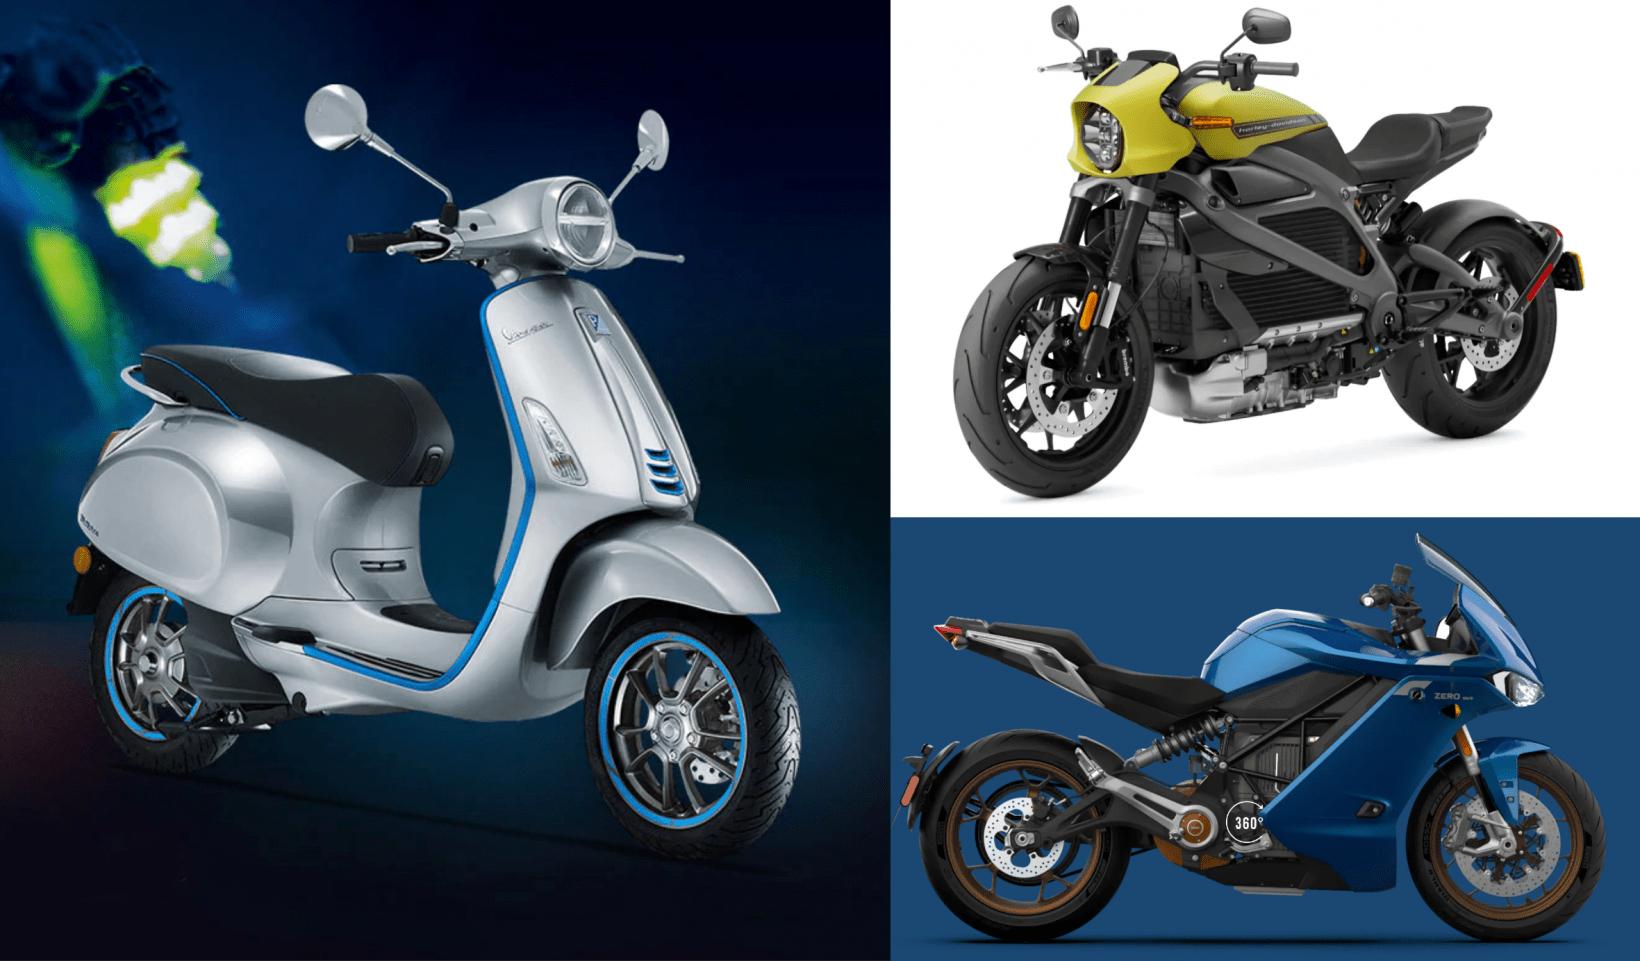 vespa, harley-davidson, zero, motorbikes, scooters, two-wheels